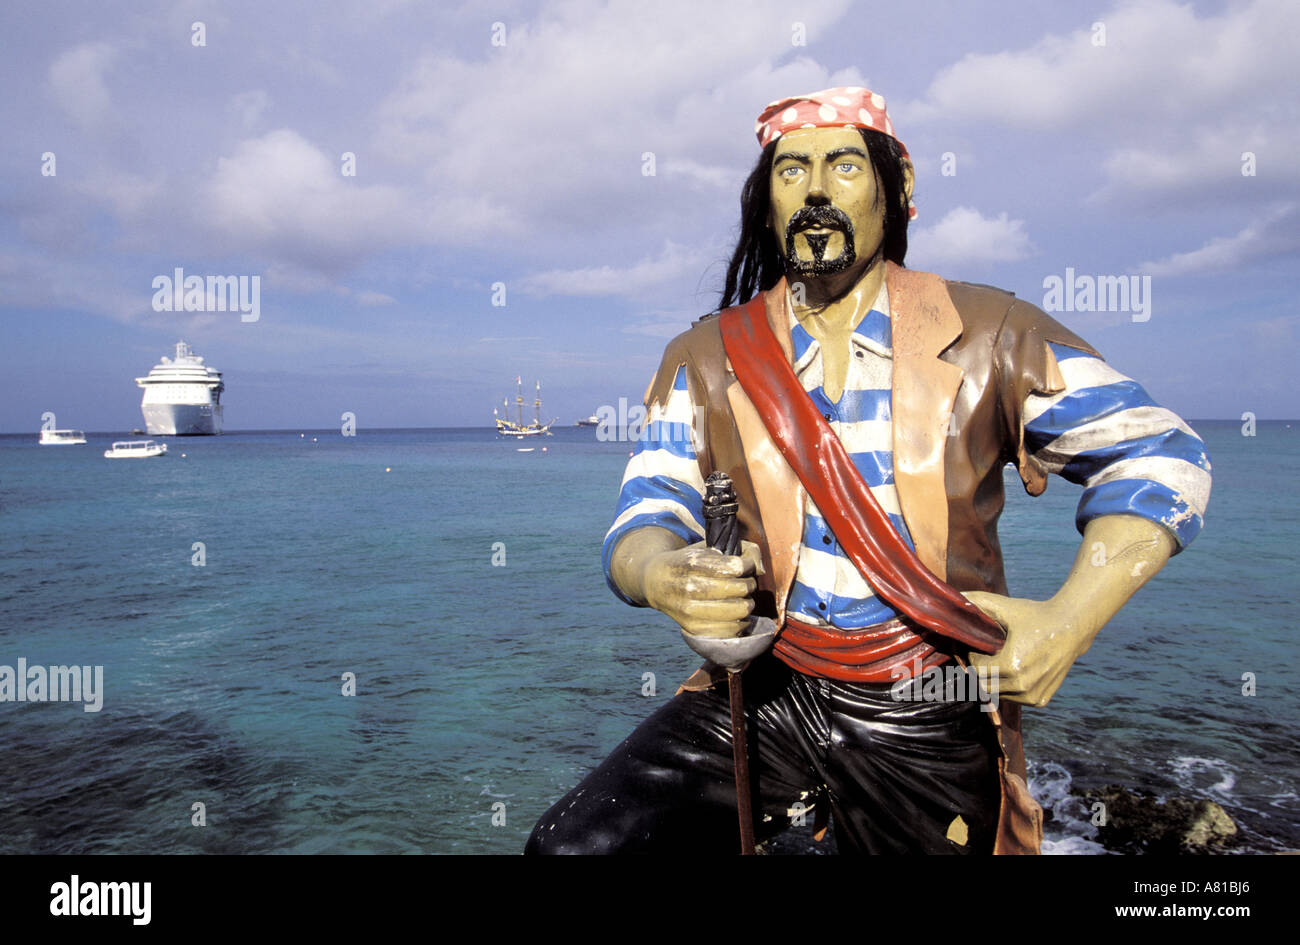 Cayman Islands, Grand Cayman Brac, Pirates Week Festival, a pirate statue in Hog Sty Bay - Stock Image